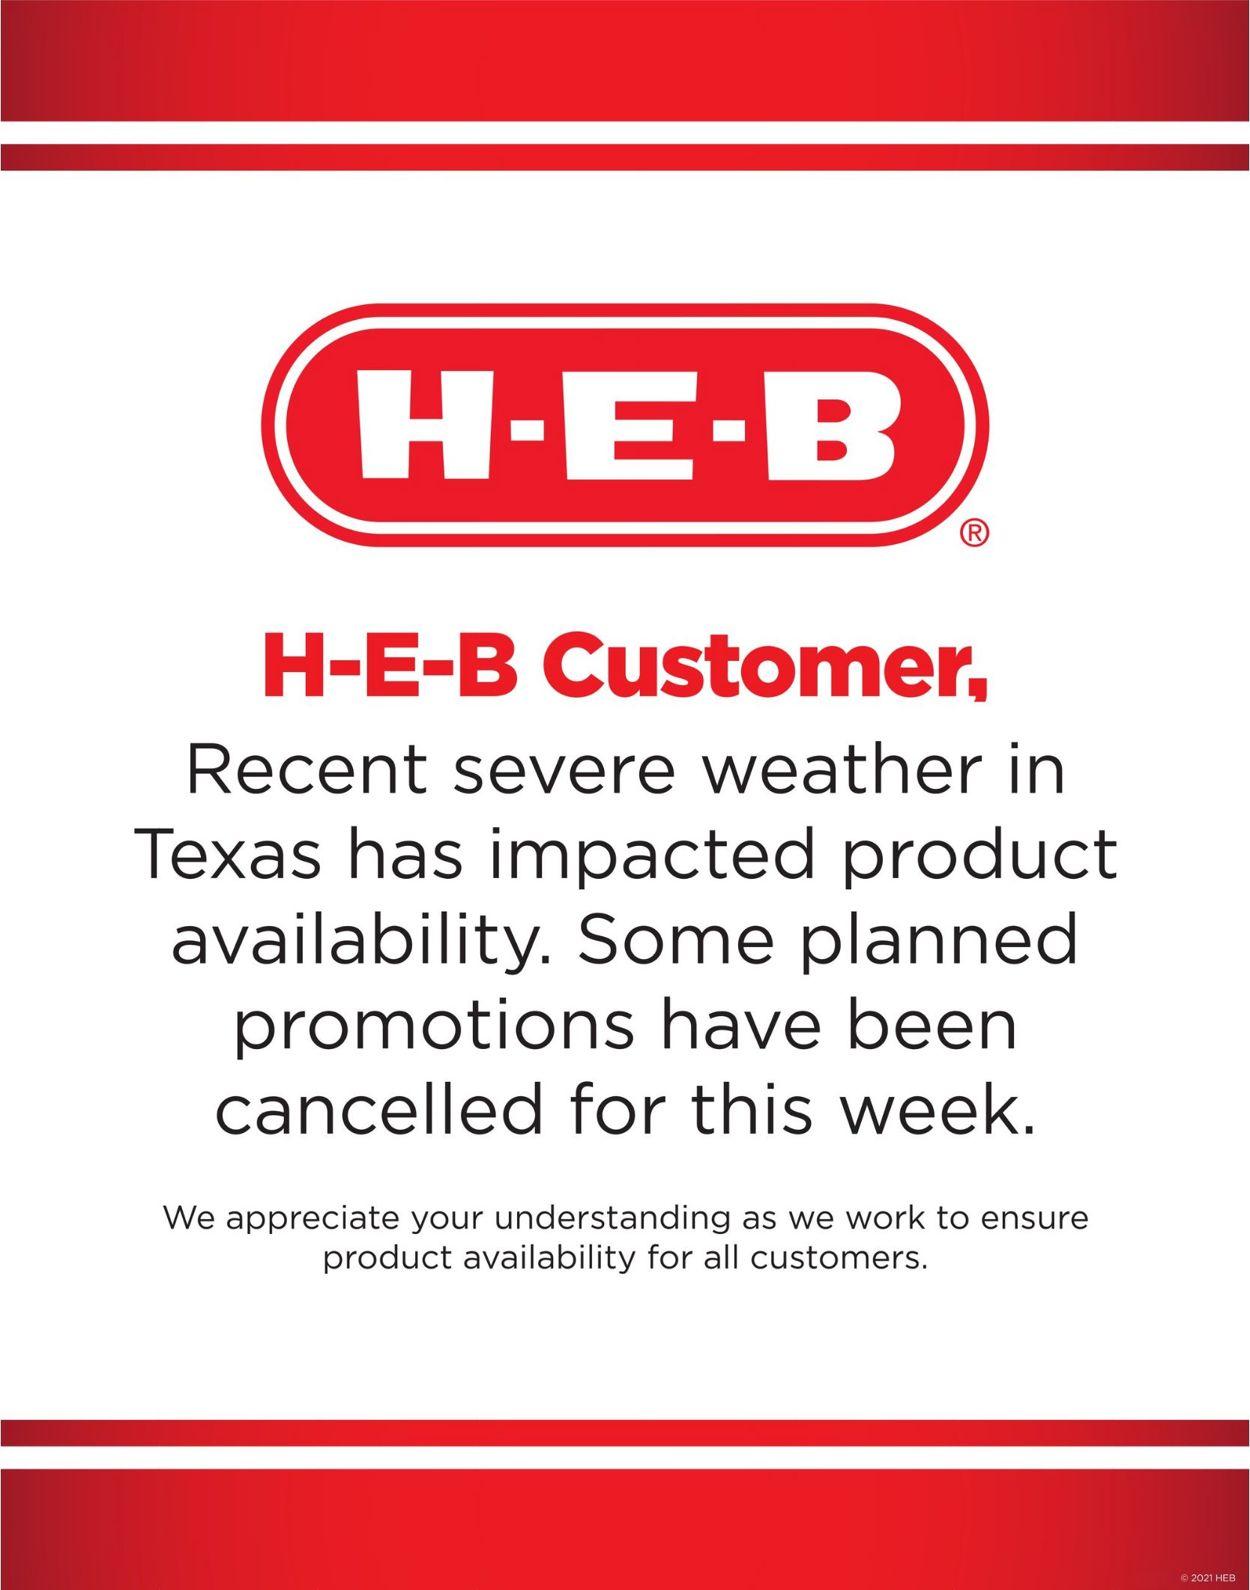 H-E-B weekly-ad